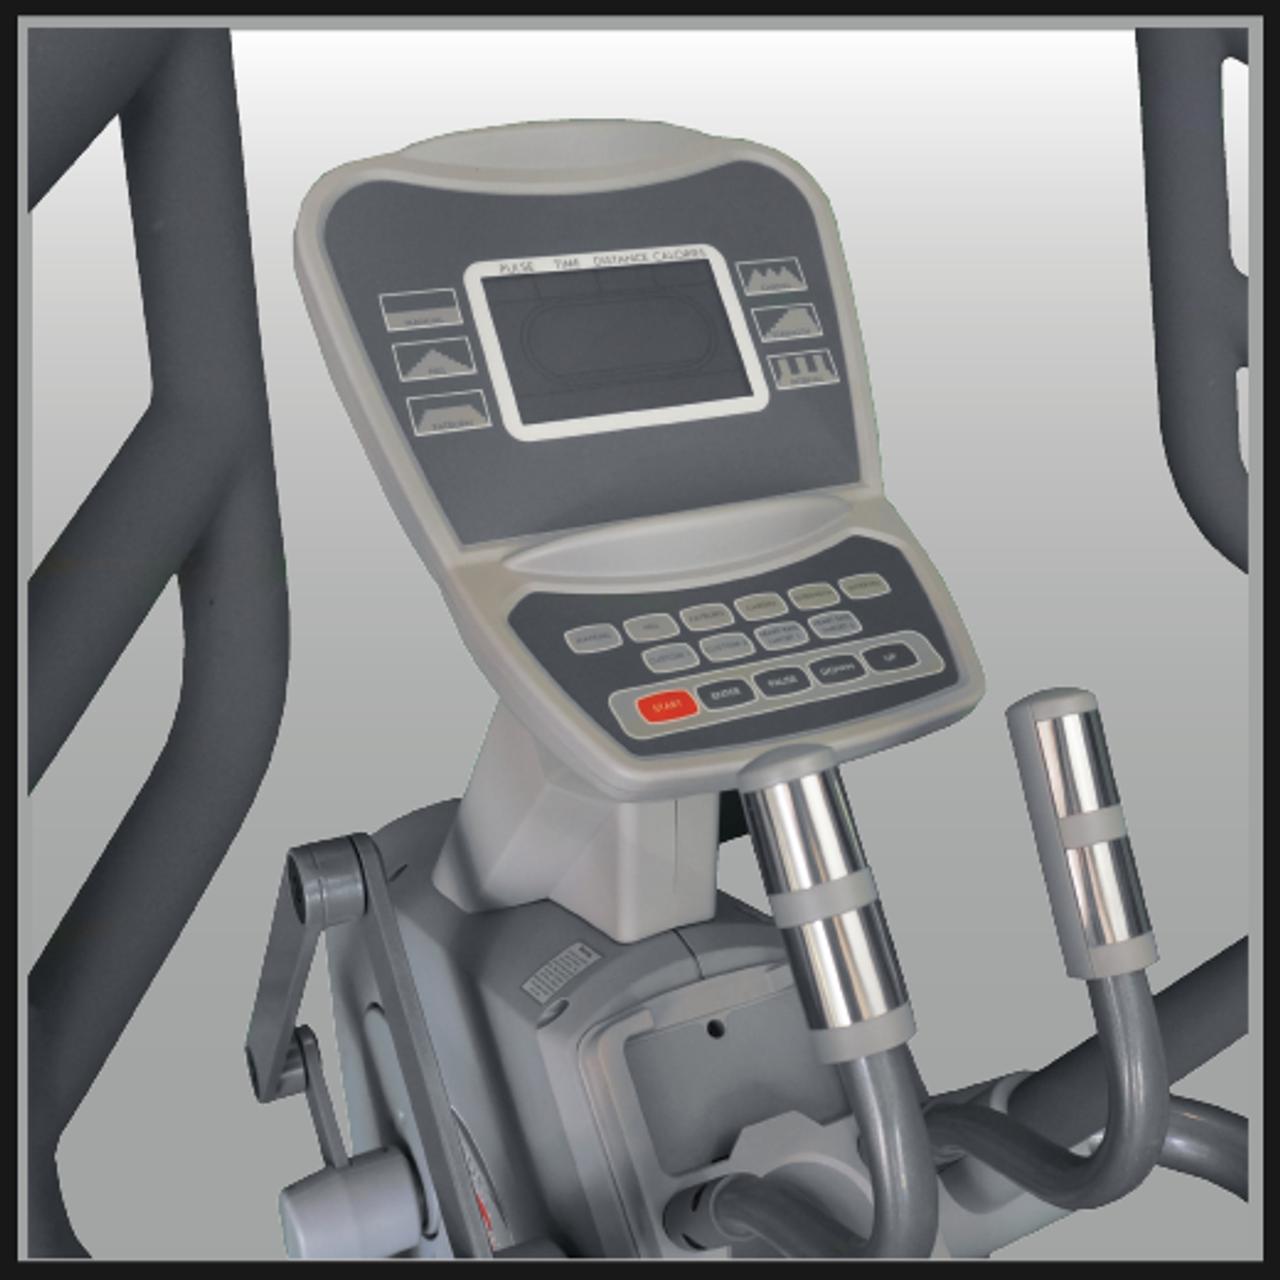 Burn Fitness S-II Ultra Elliptical